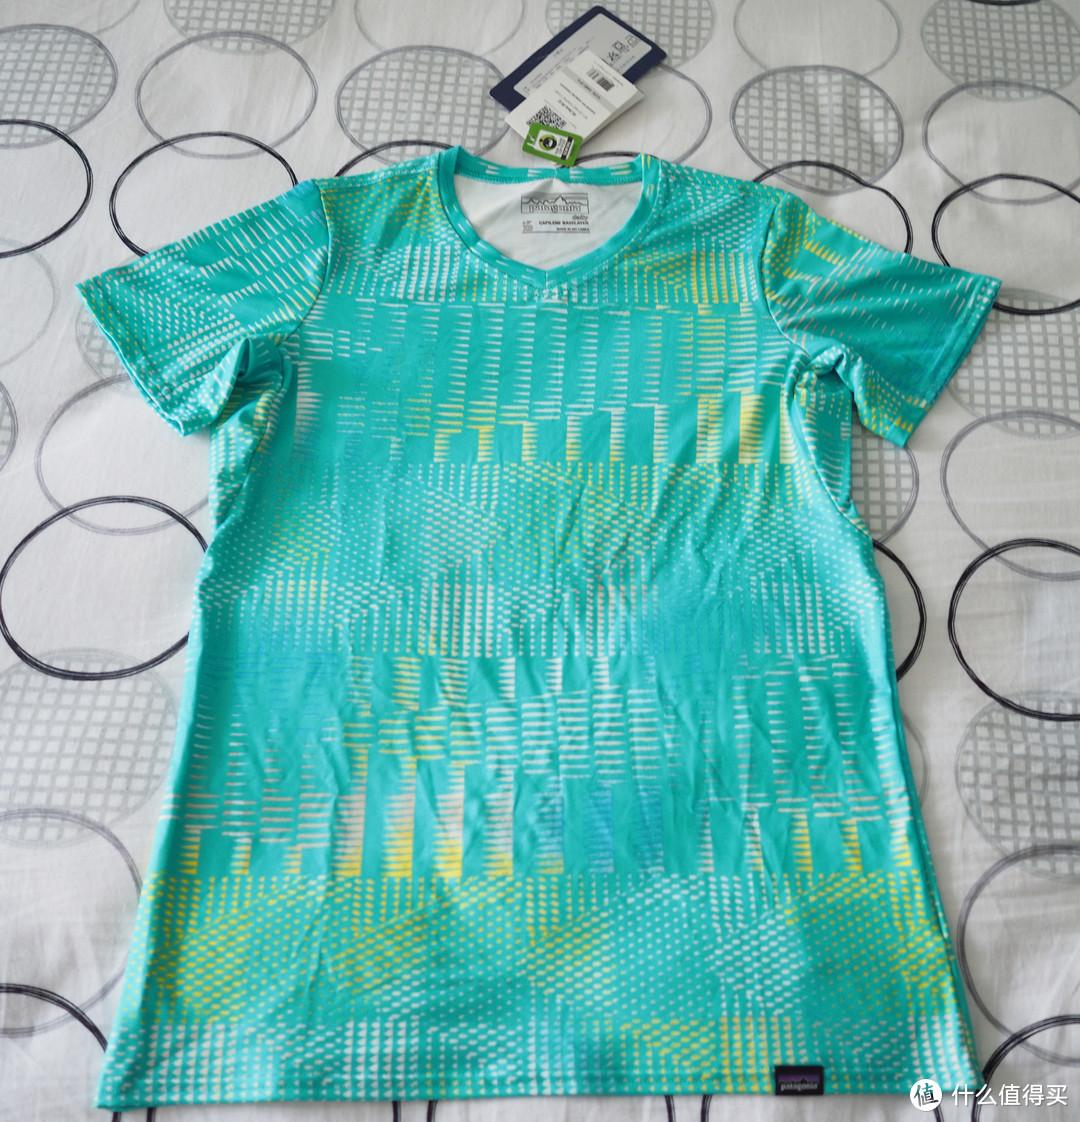 Patagonia 女式防晒运动健身速干T恤开箱